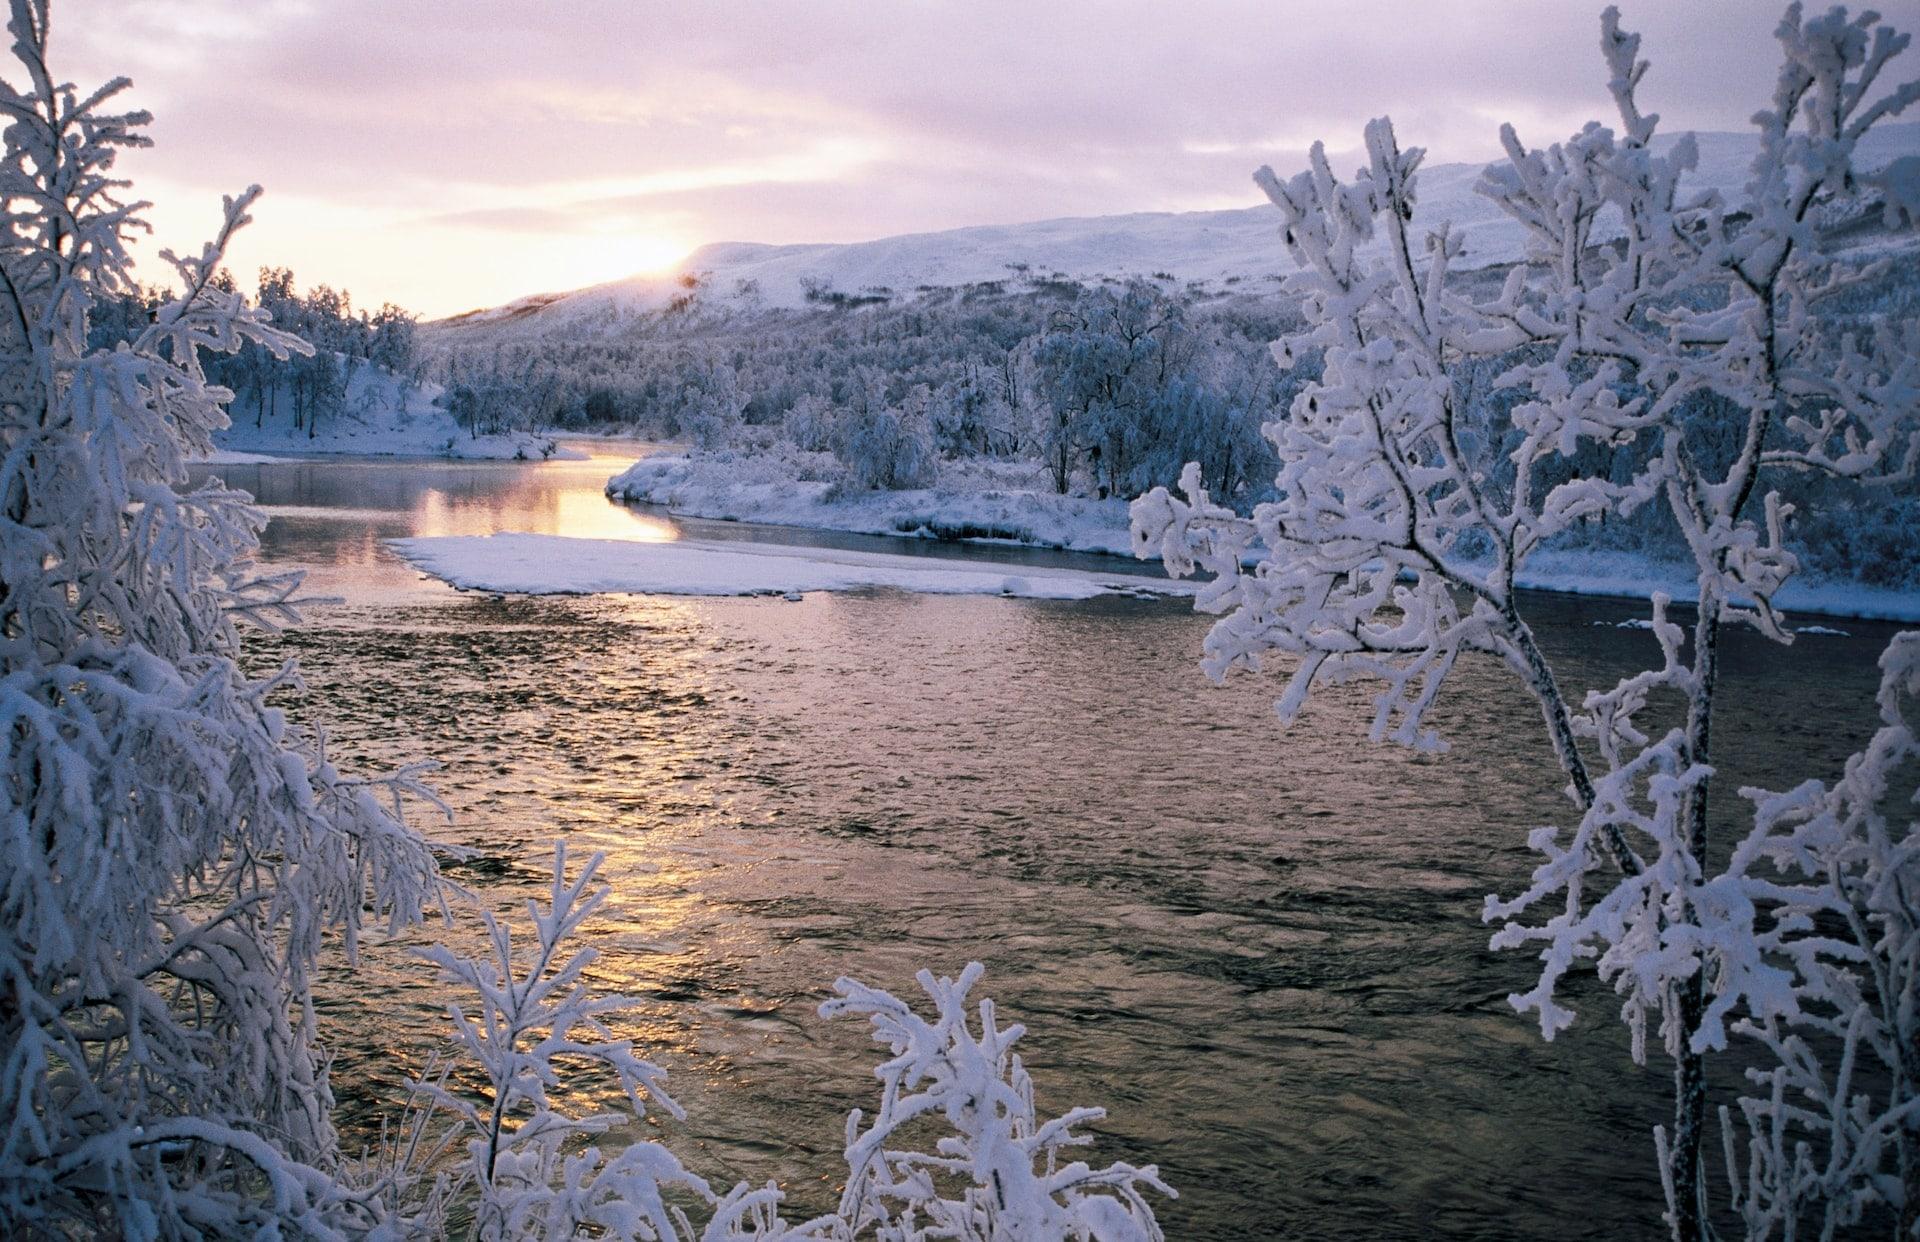 اومئو (Umean) در کشور سوئد